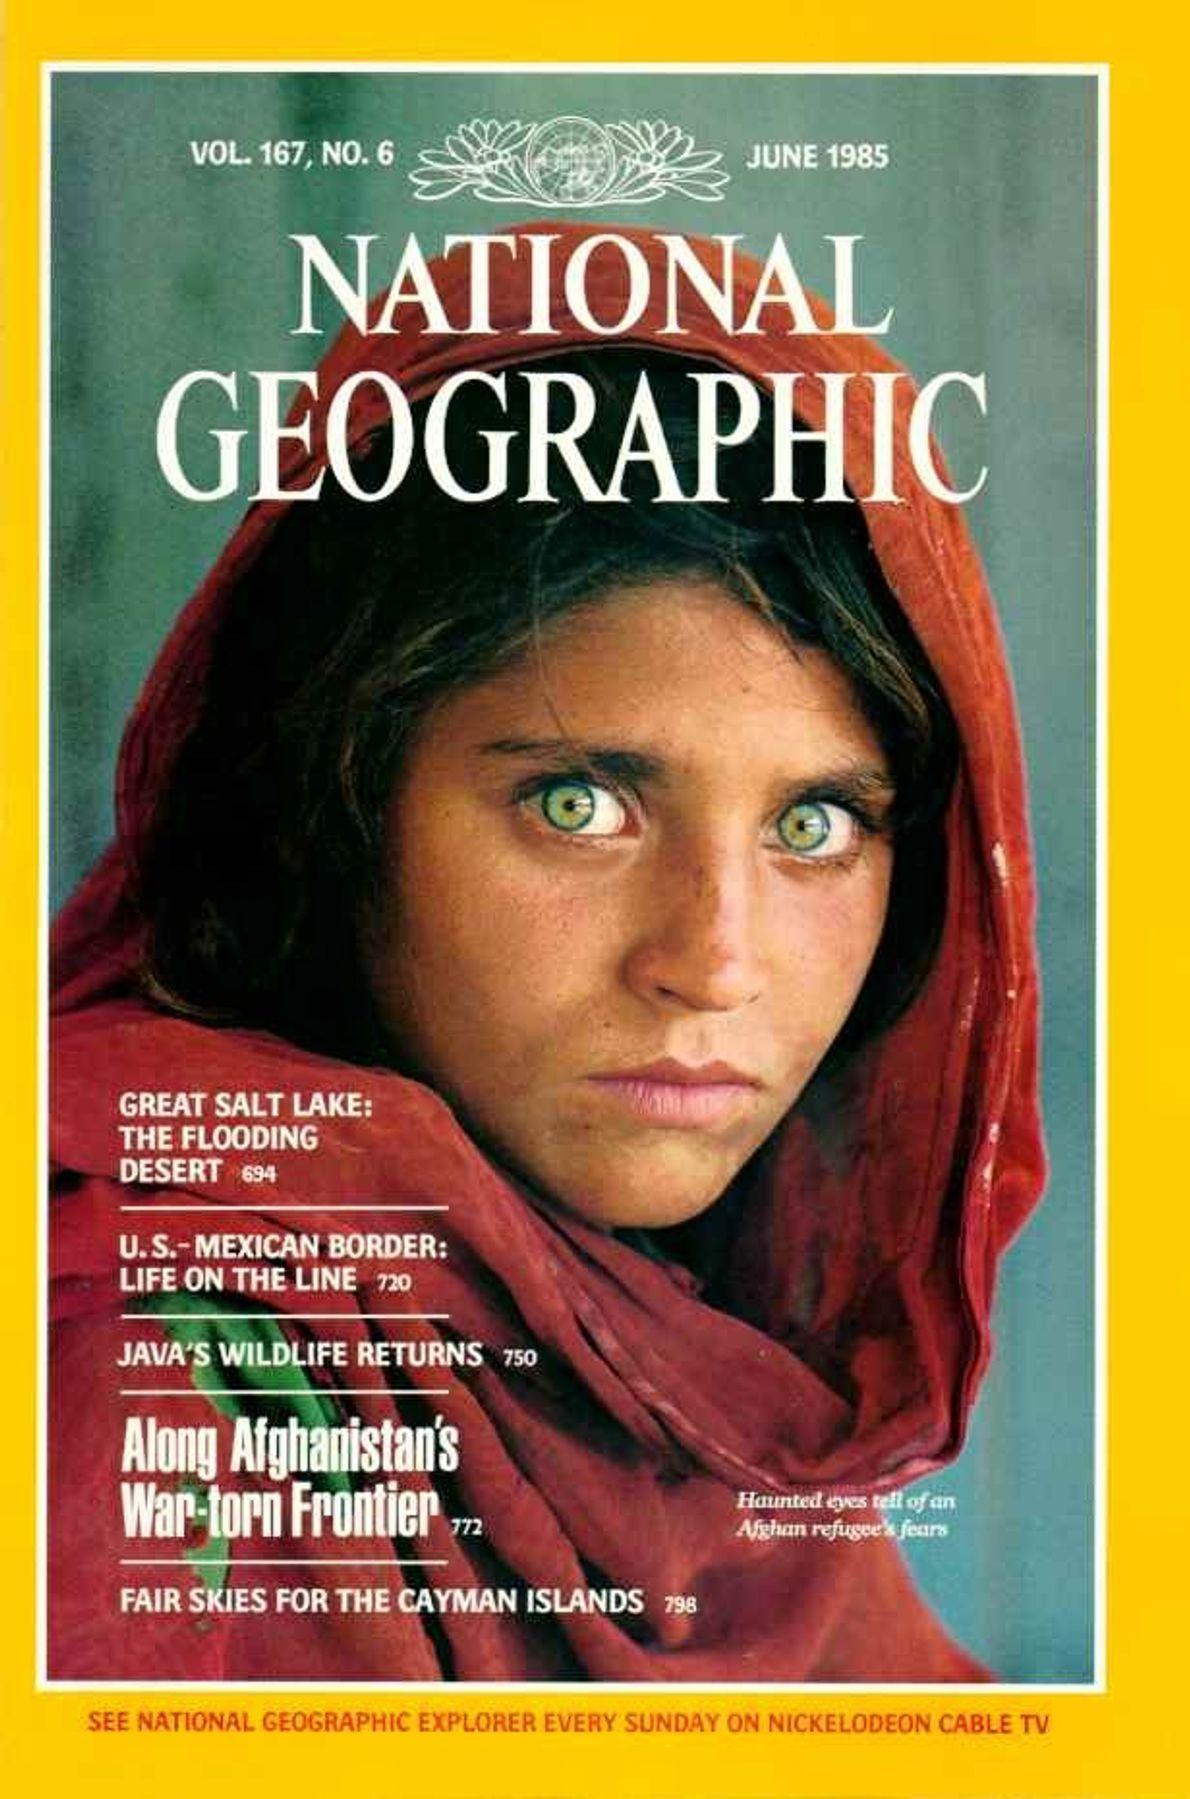 CAPA JUNHO DE 1985 — A MENINA AFEGÃ